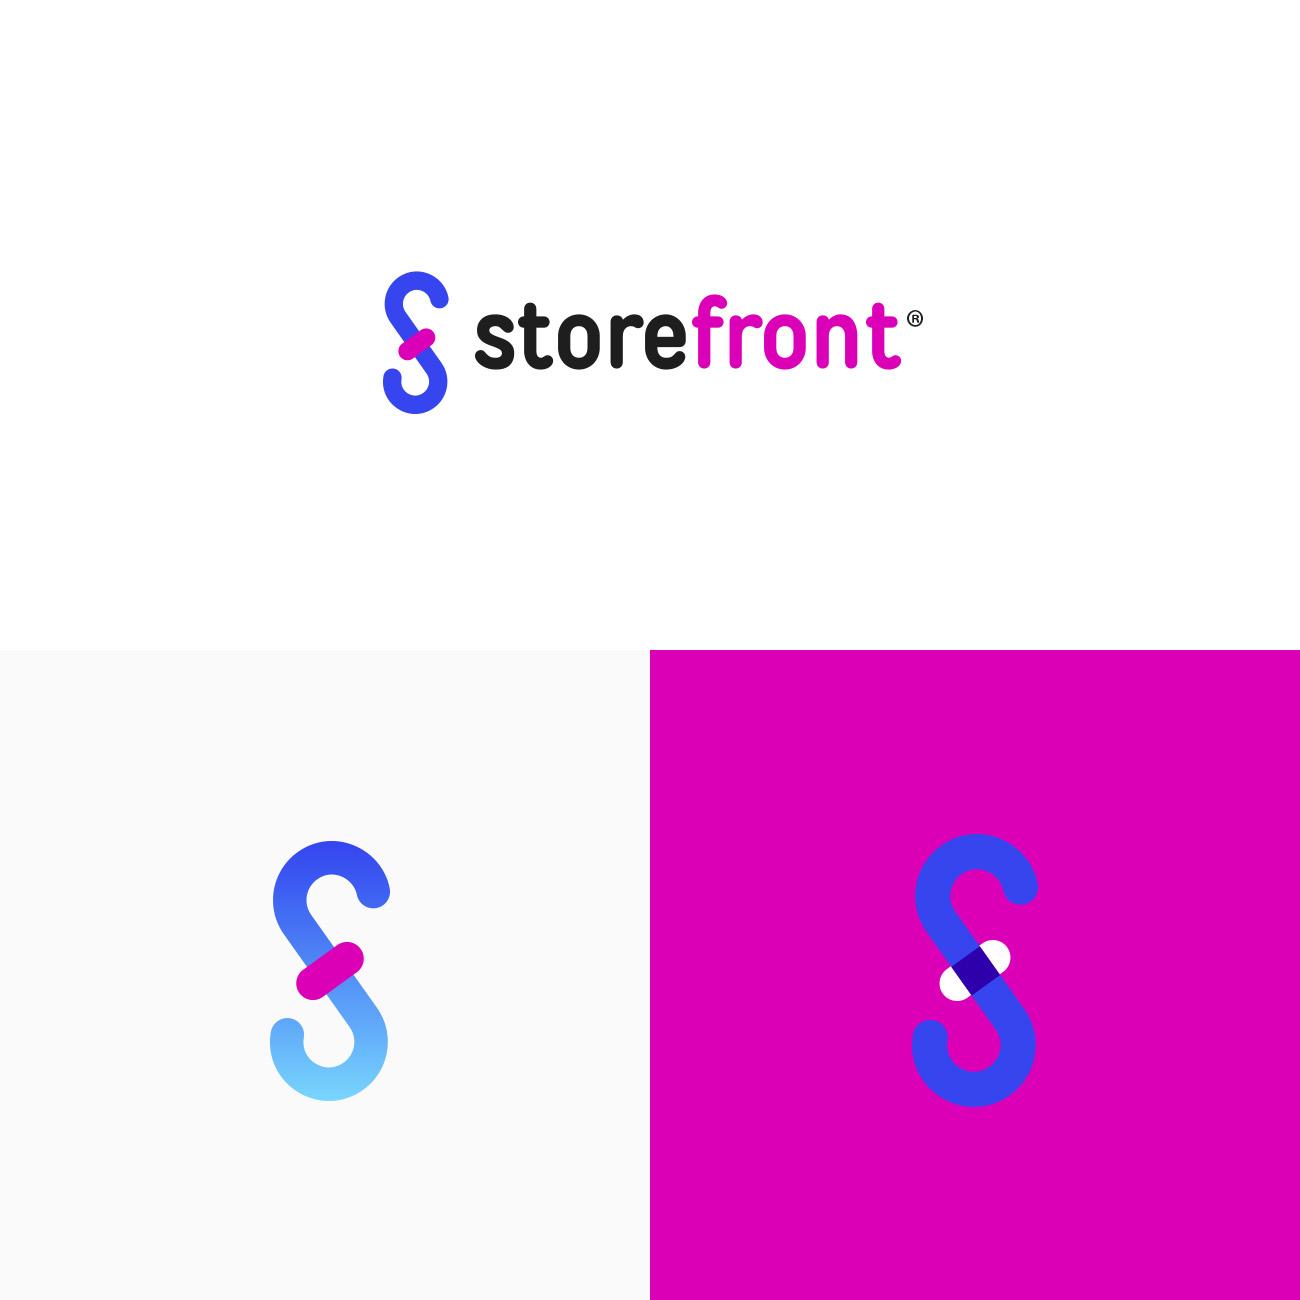 V2_1300_logos